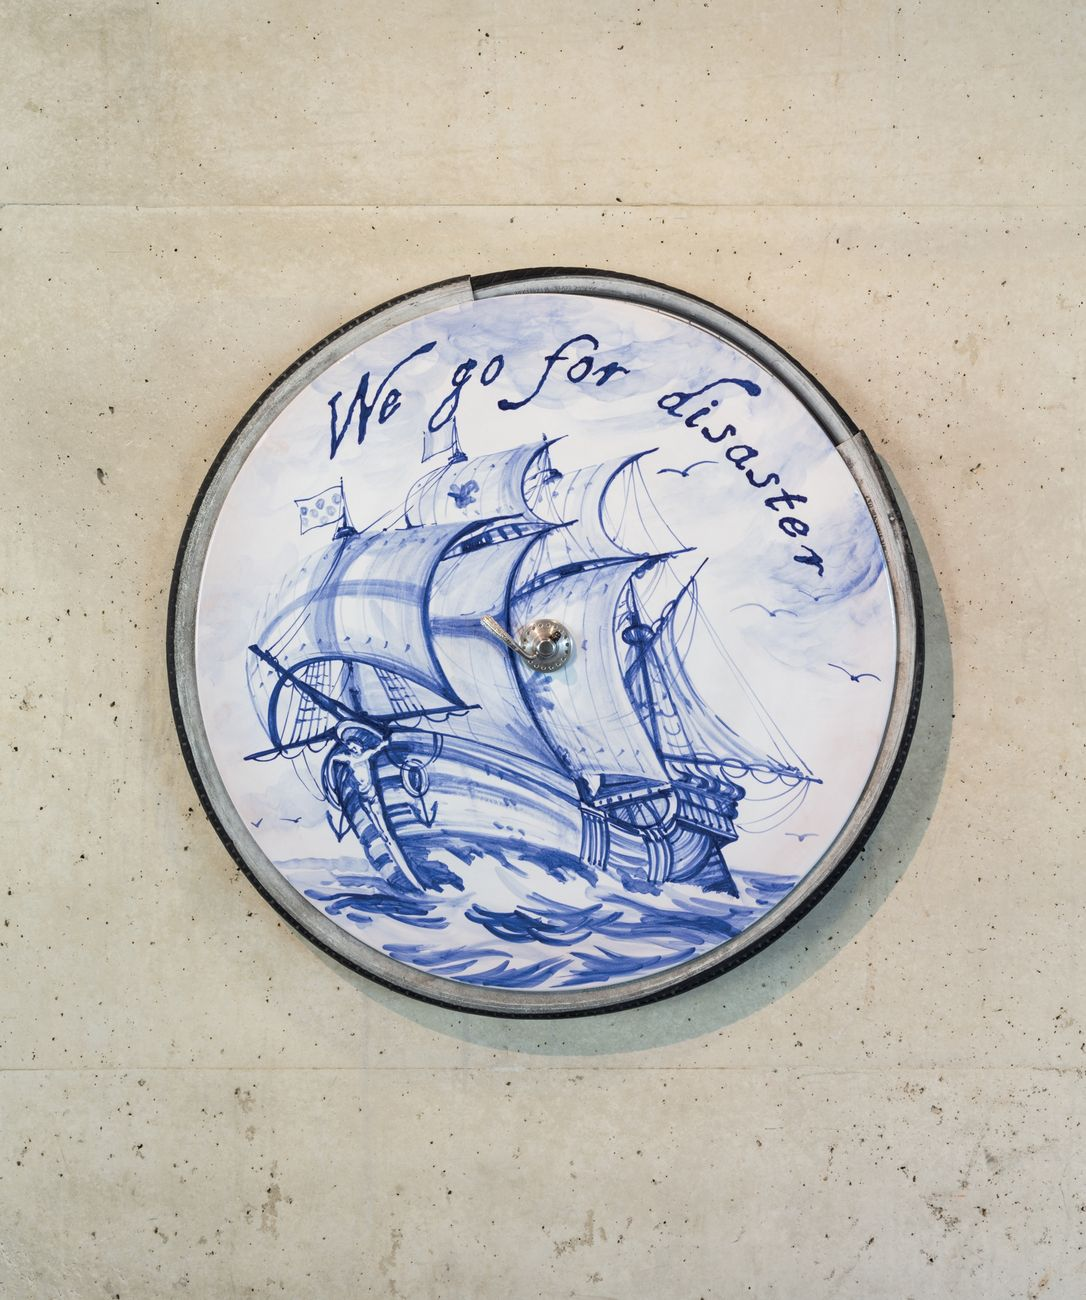 Nero/Alessandro Neretti, one bicycle wheel. we go for disaster, 2017. Museum Beelden aan Zee, L'Aja. Courtesy the artist. Photo Andrea Piffari